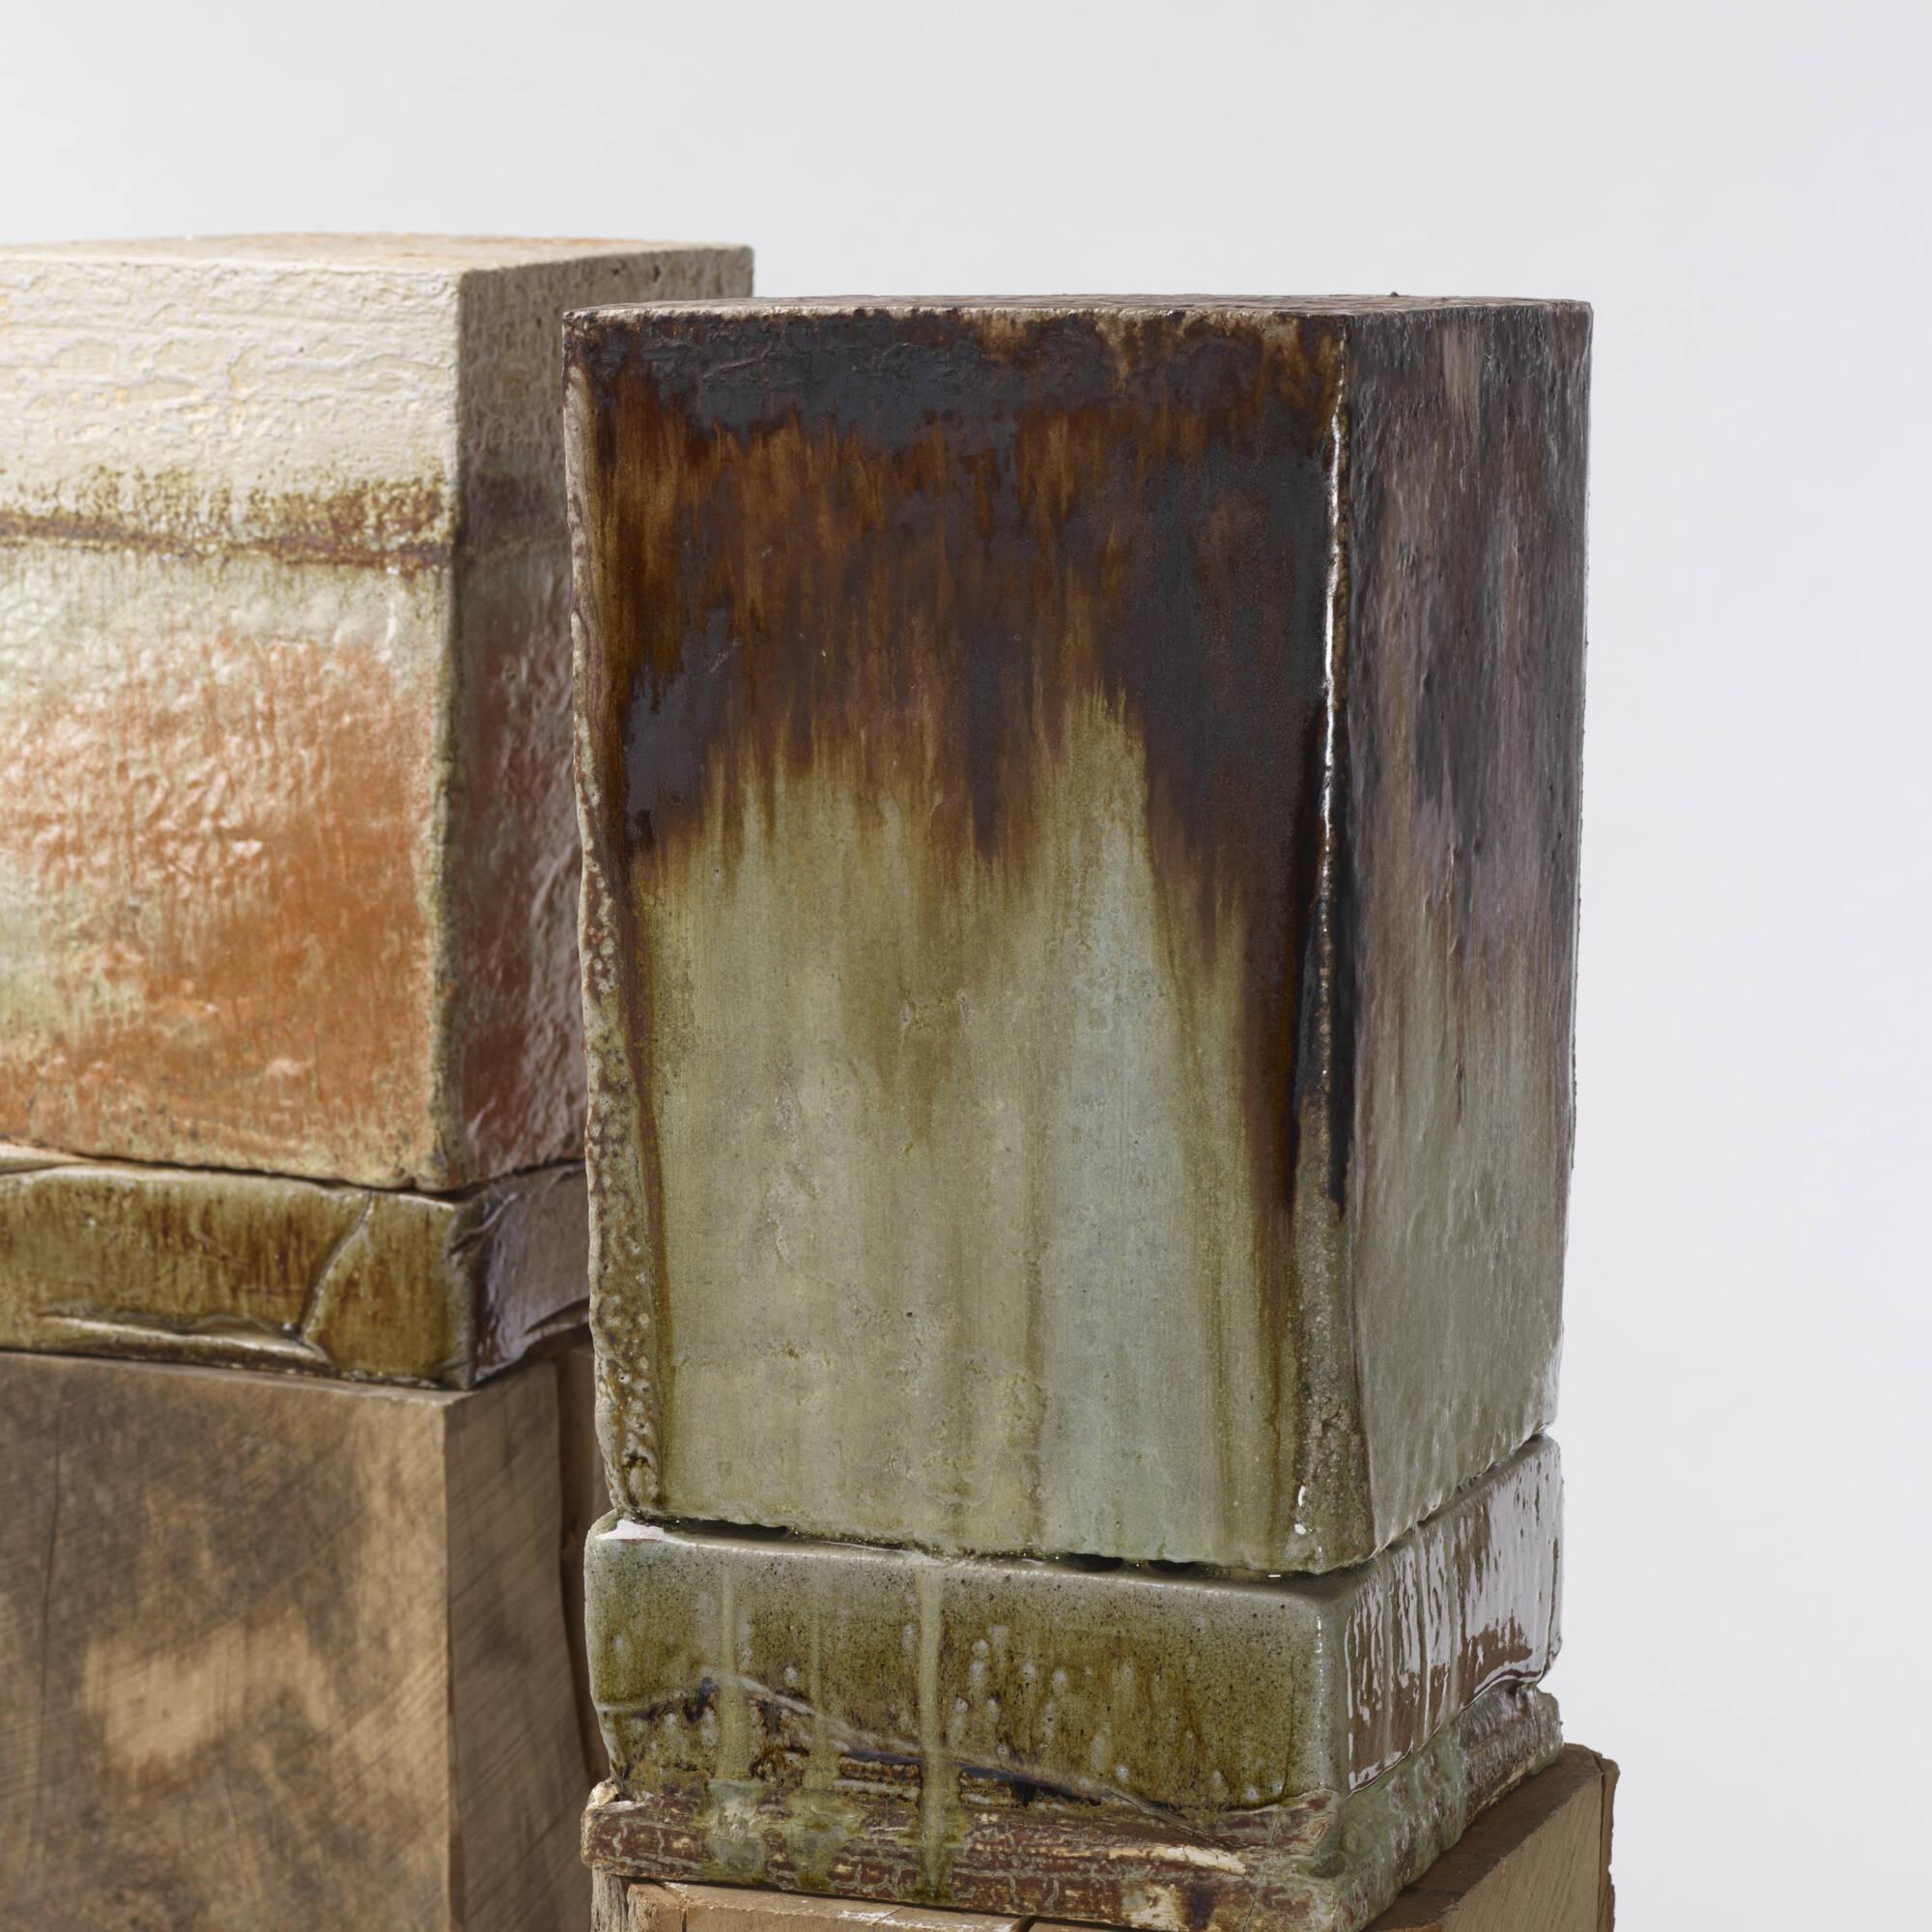 247: Tetsuya Yamada / Untitled (three works) (3 of 3)